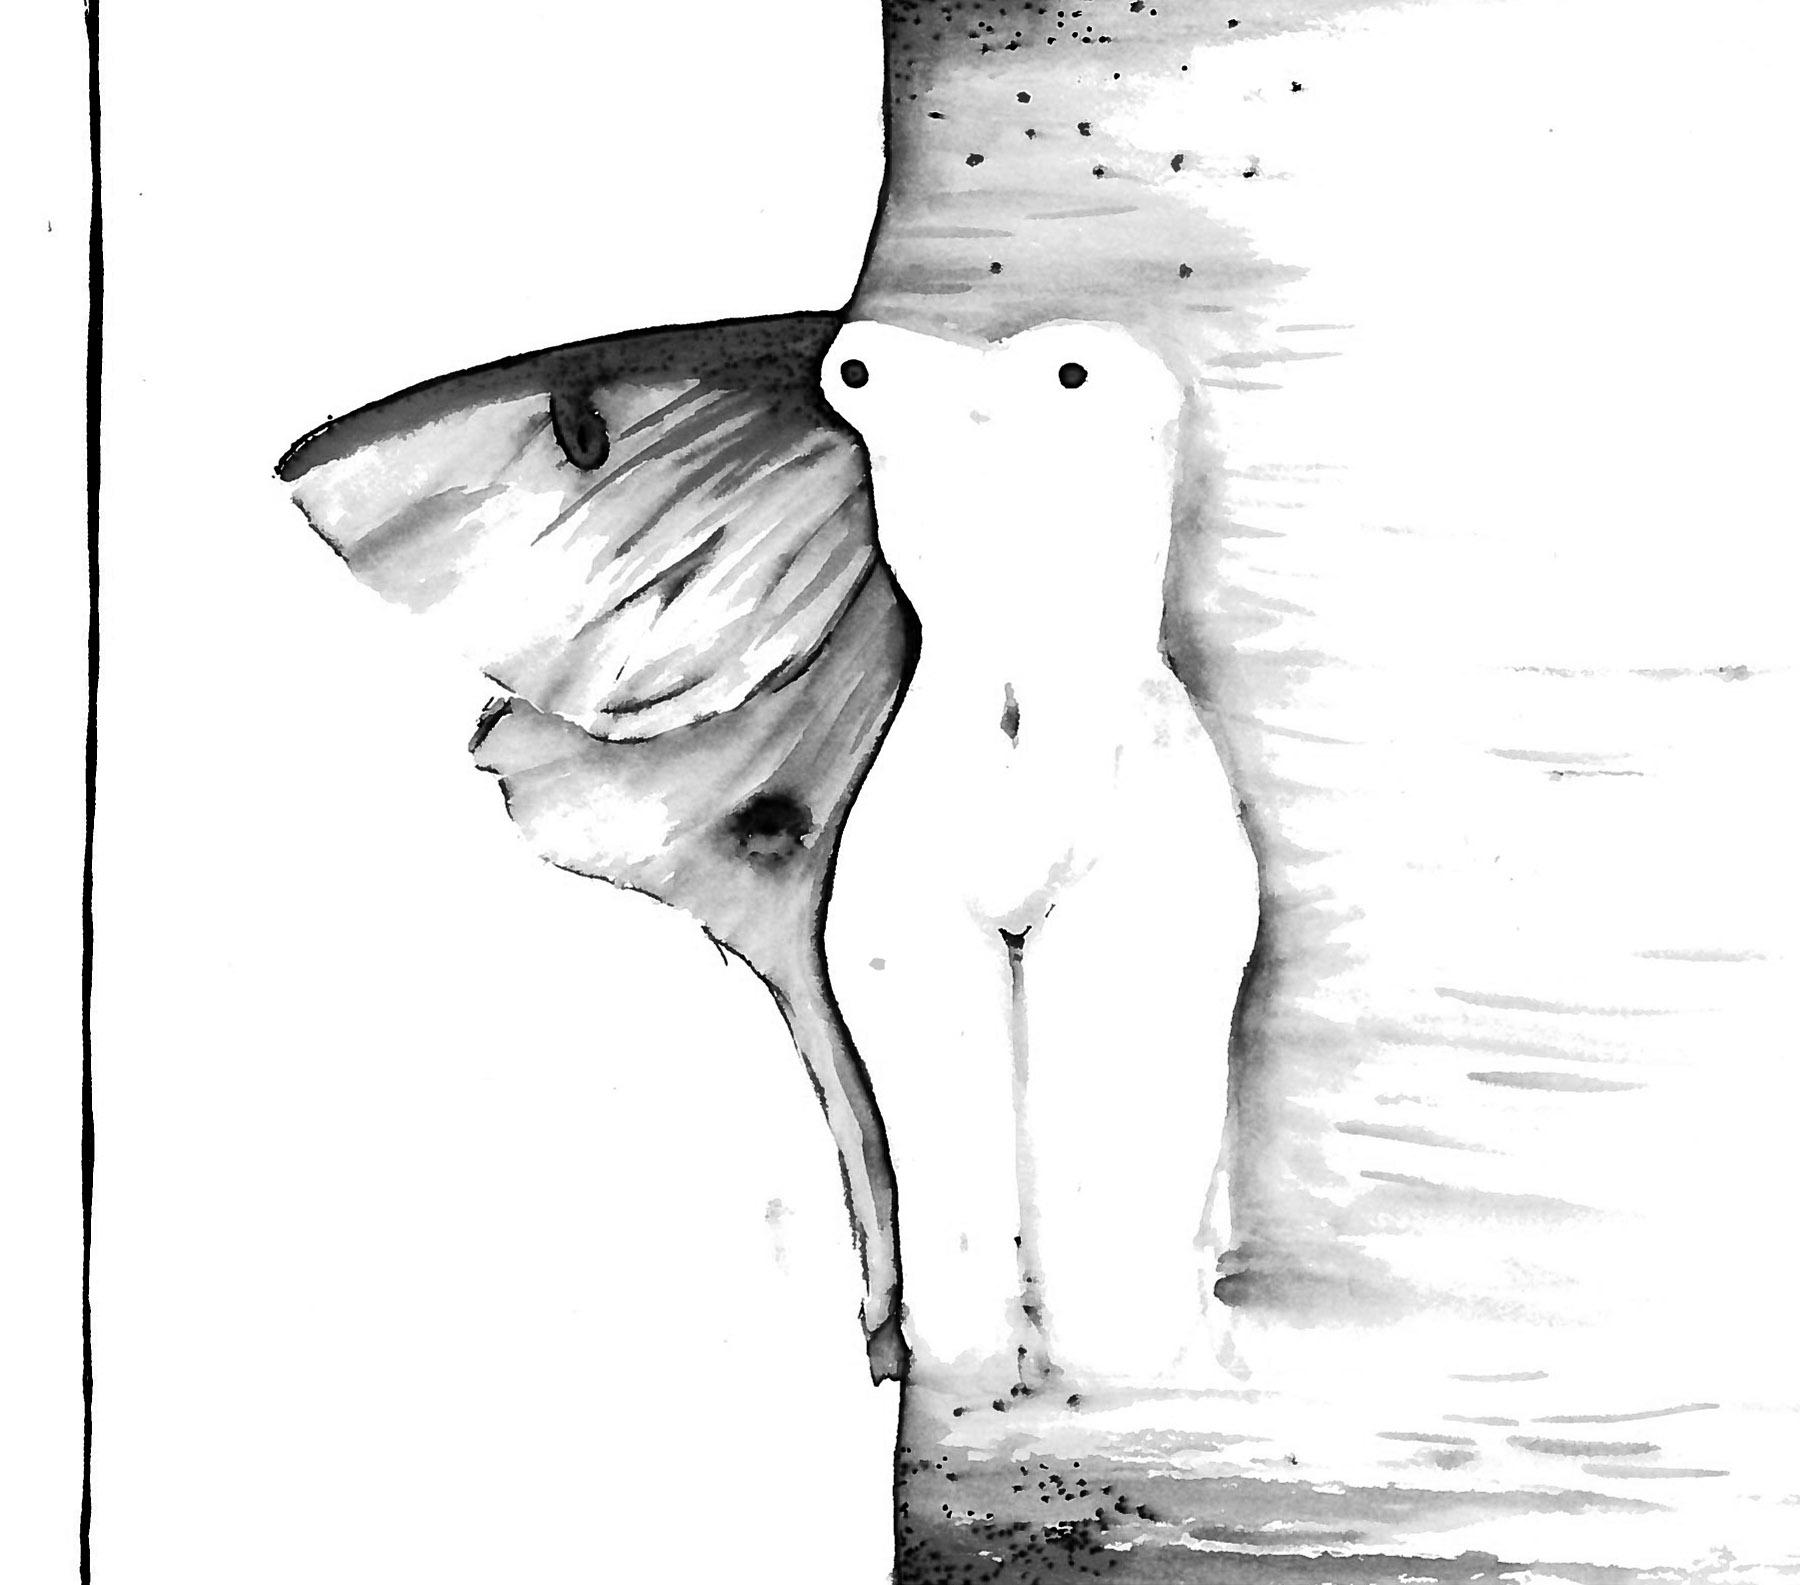 lune , Suki Hyman, Volume VIII Issue III